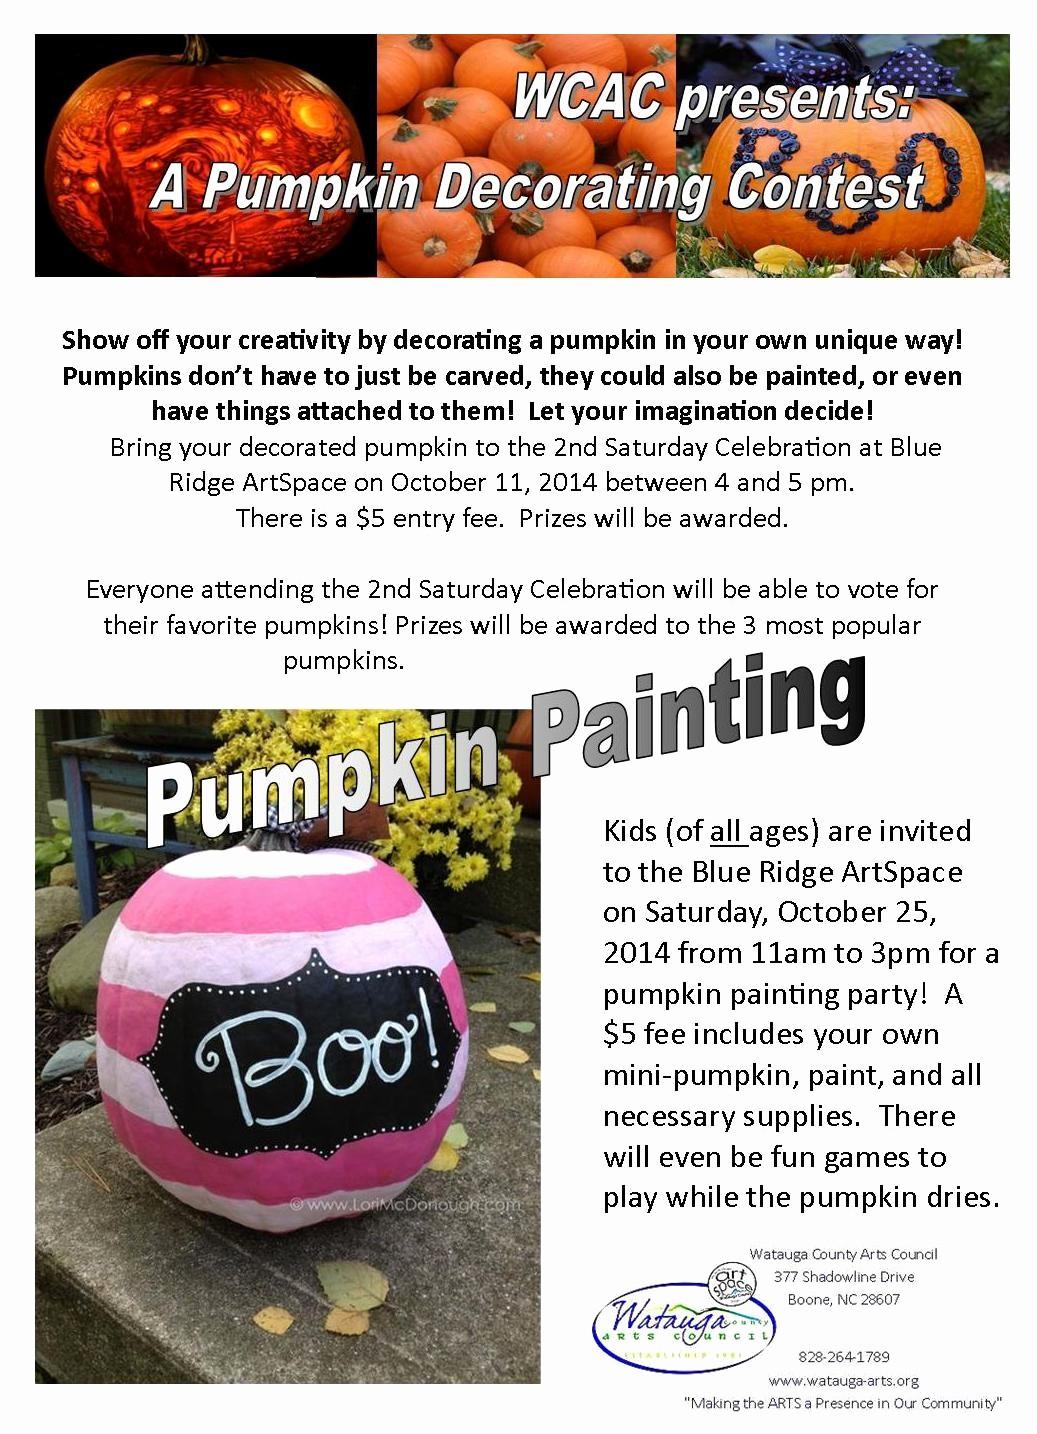 Pumpkin Carving Contest Flyer Template Luxury Pumpkins